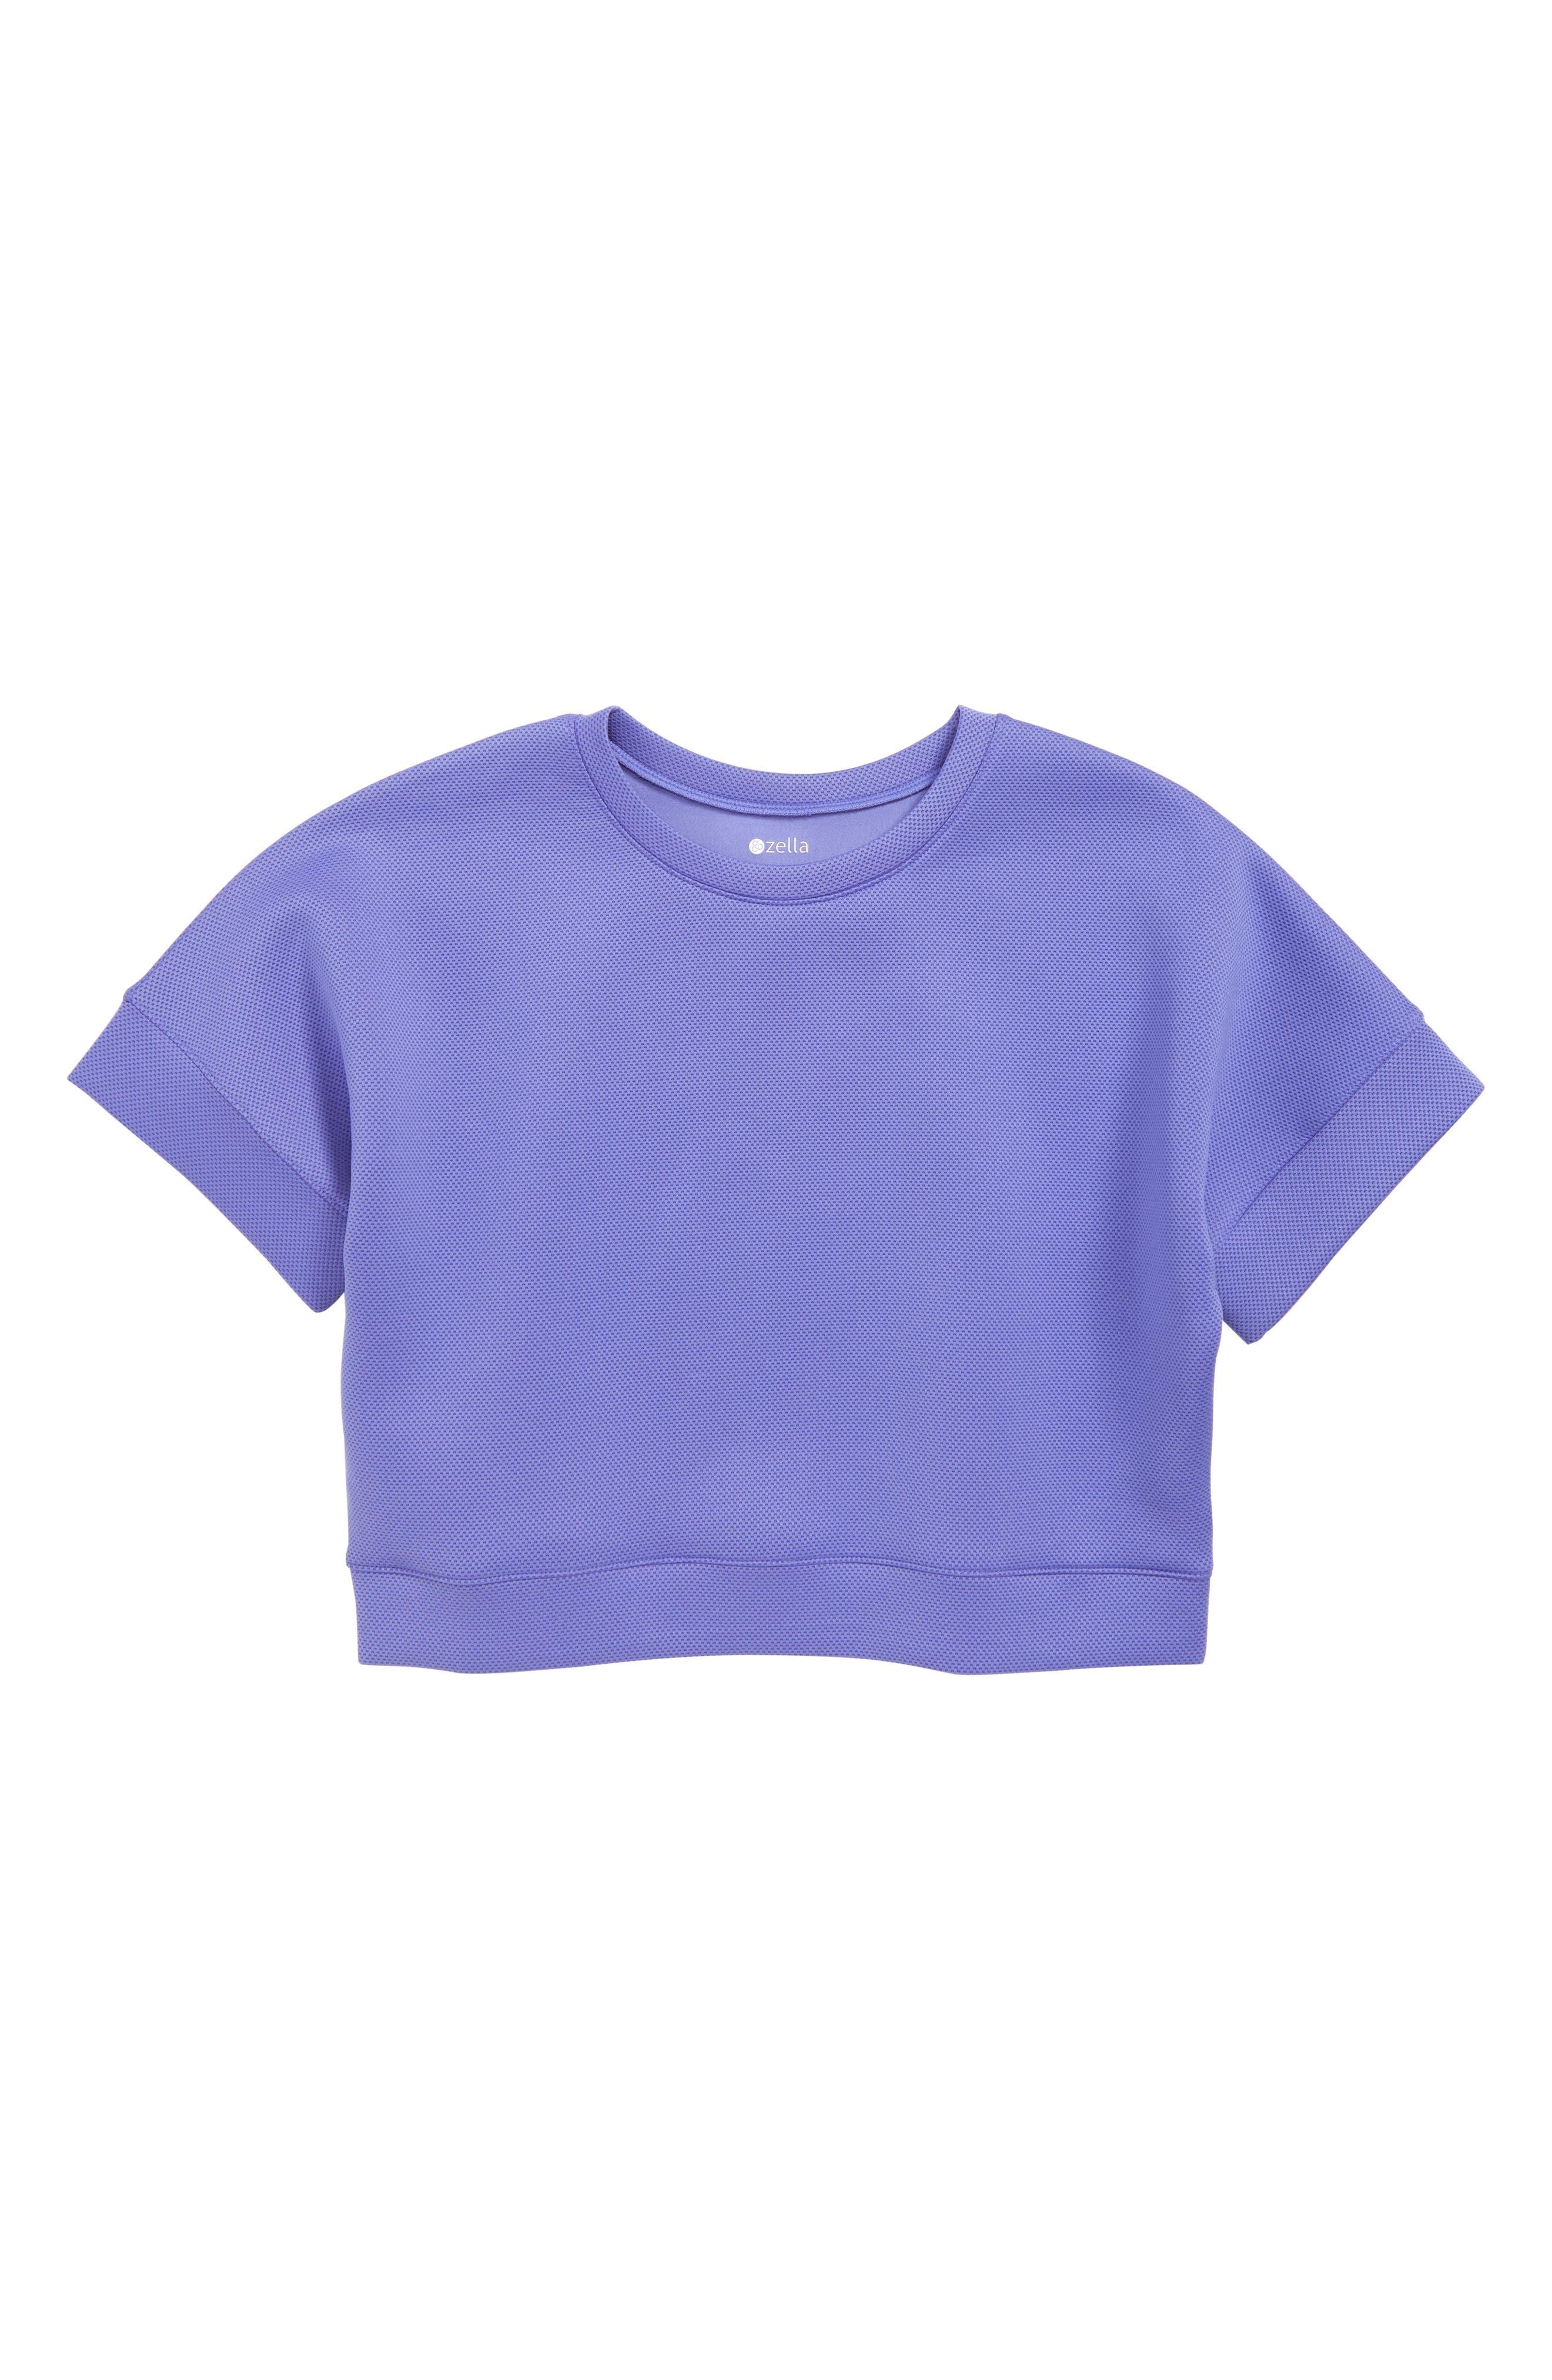 ZELLA GIRL Spacer Pullover, Main, color, PURPLE BAJA